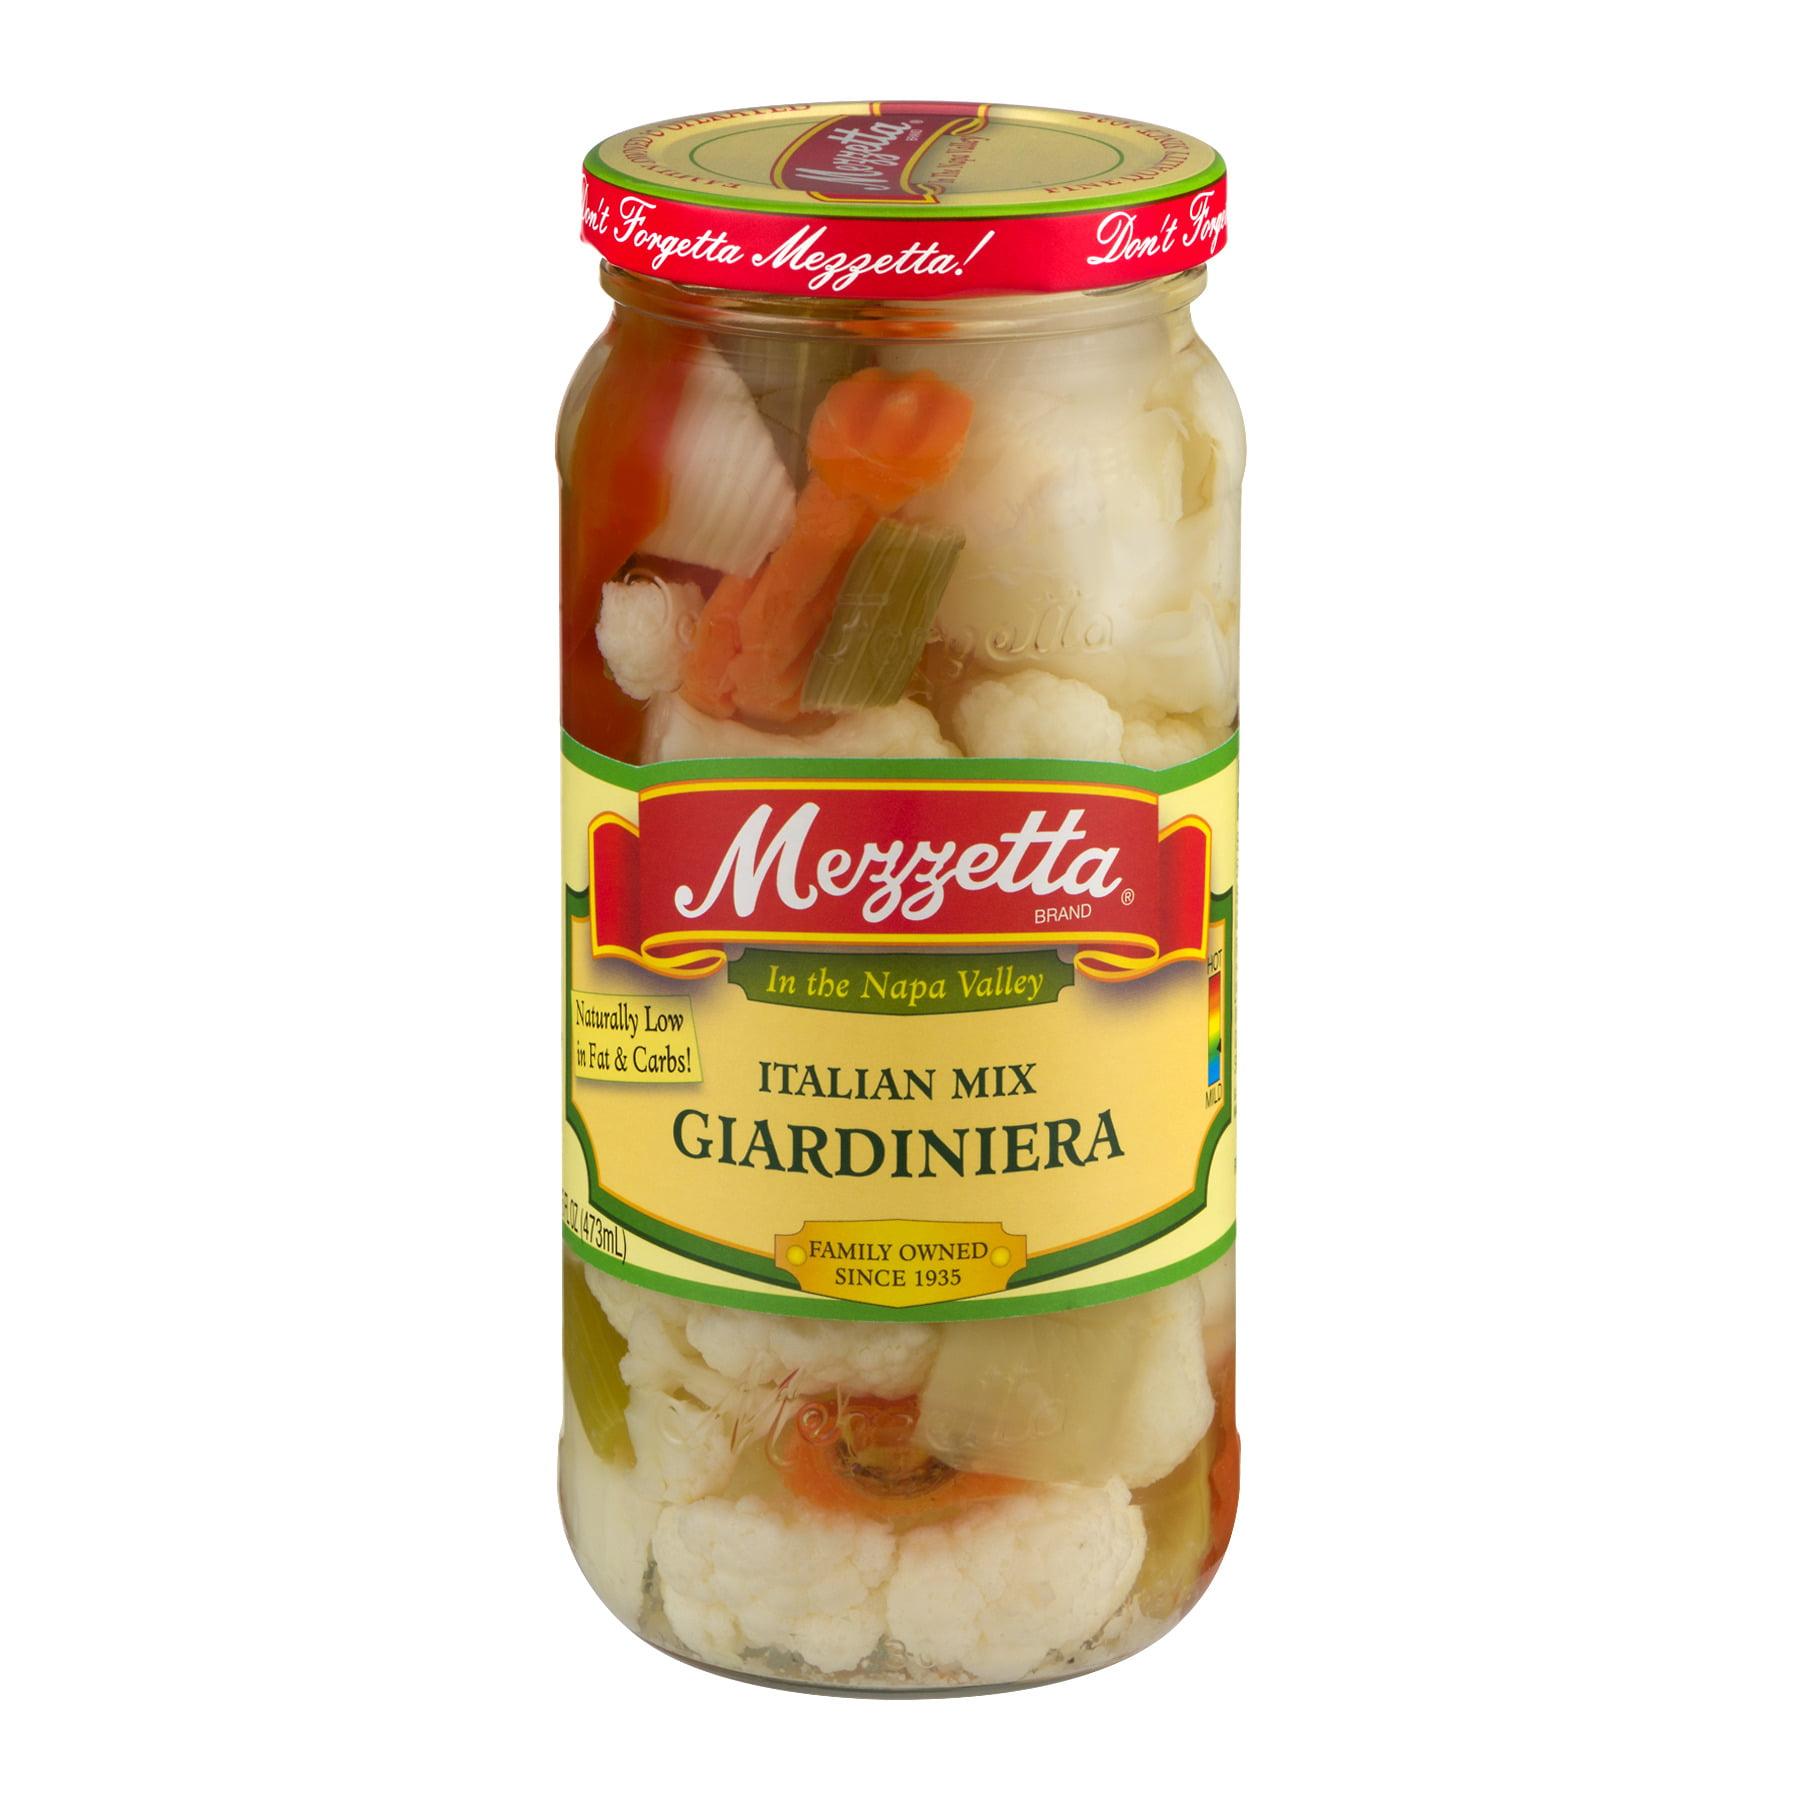 (6 Pack) Mezzetta Italian Mix Giardiniera, 16 Oz